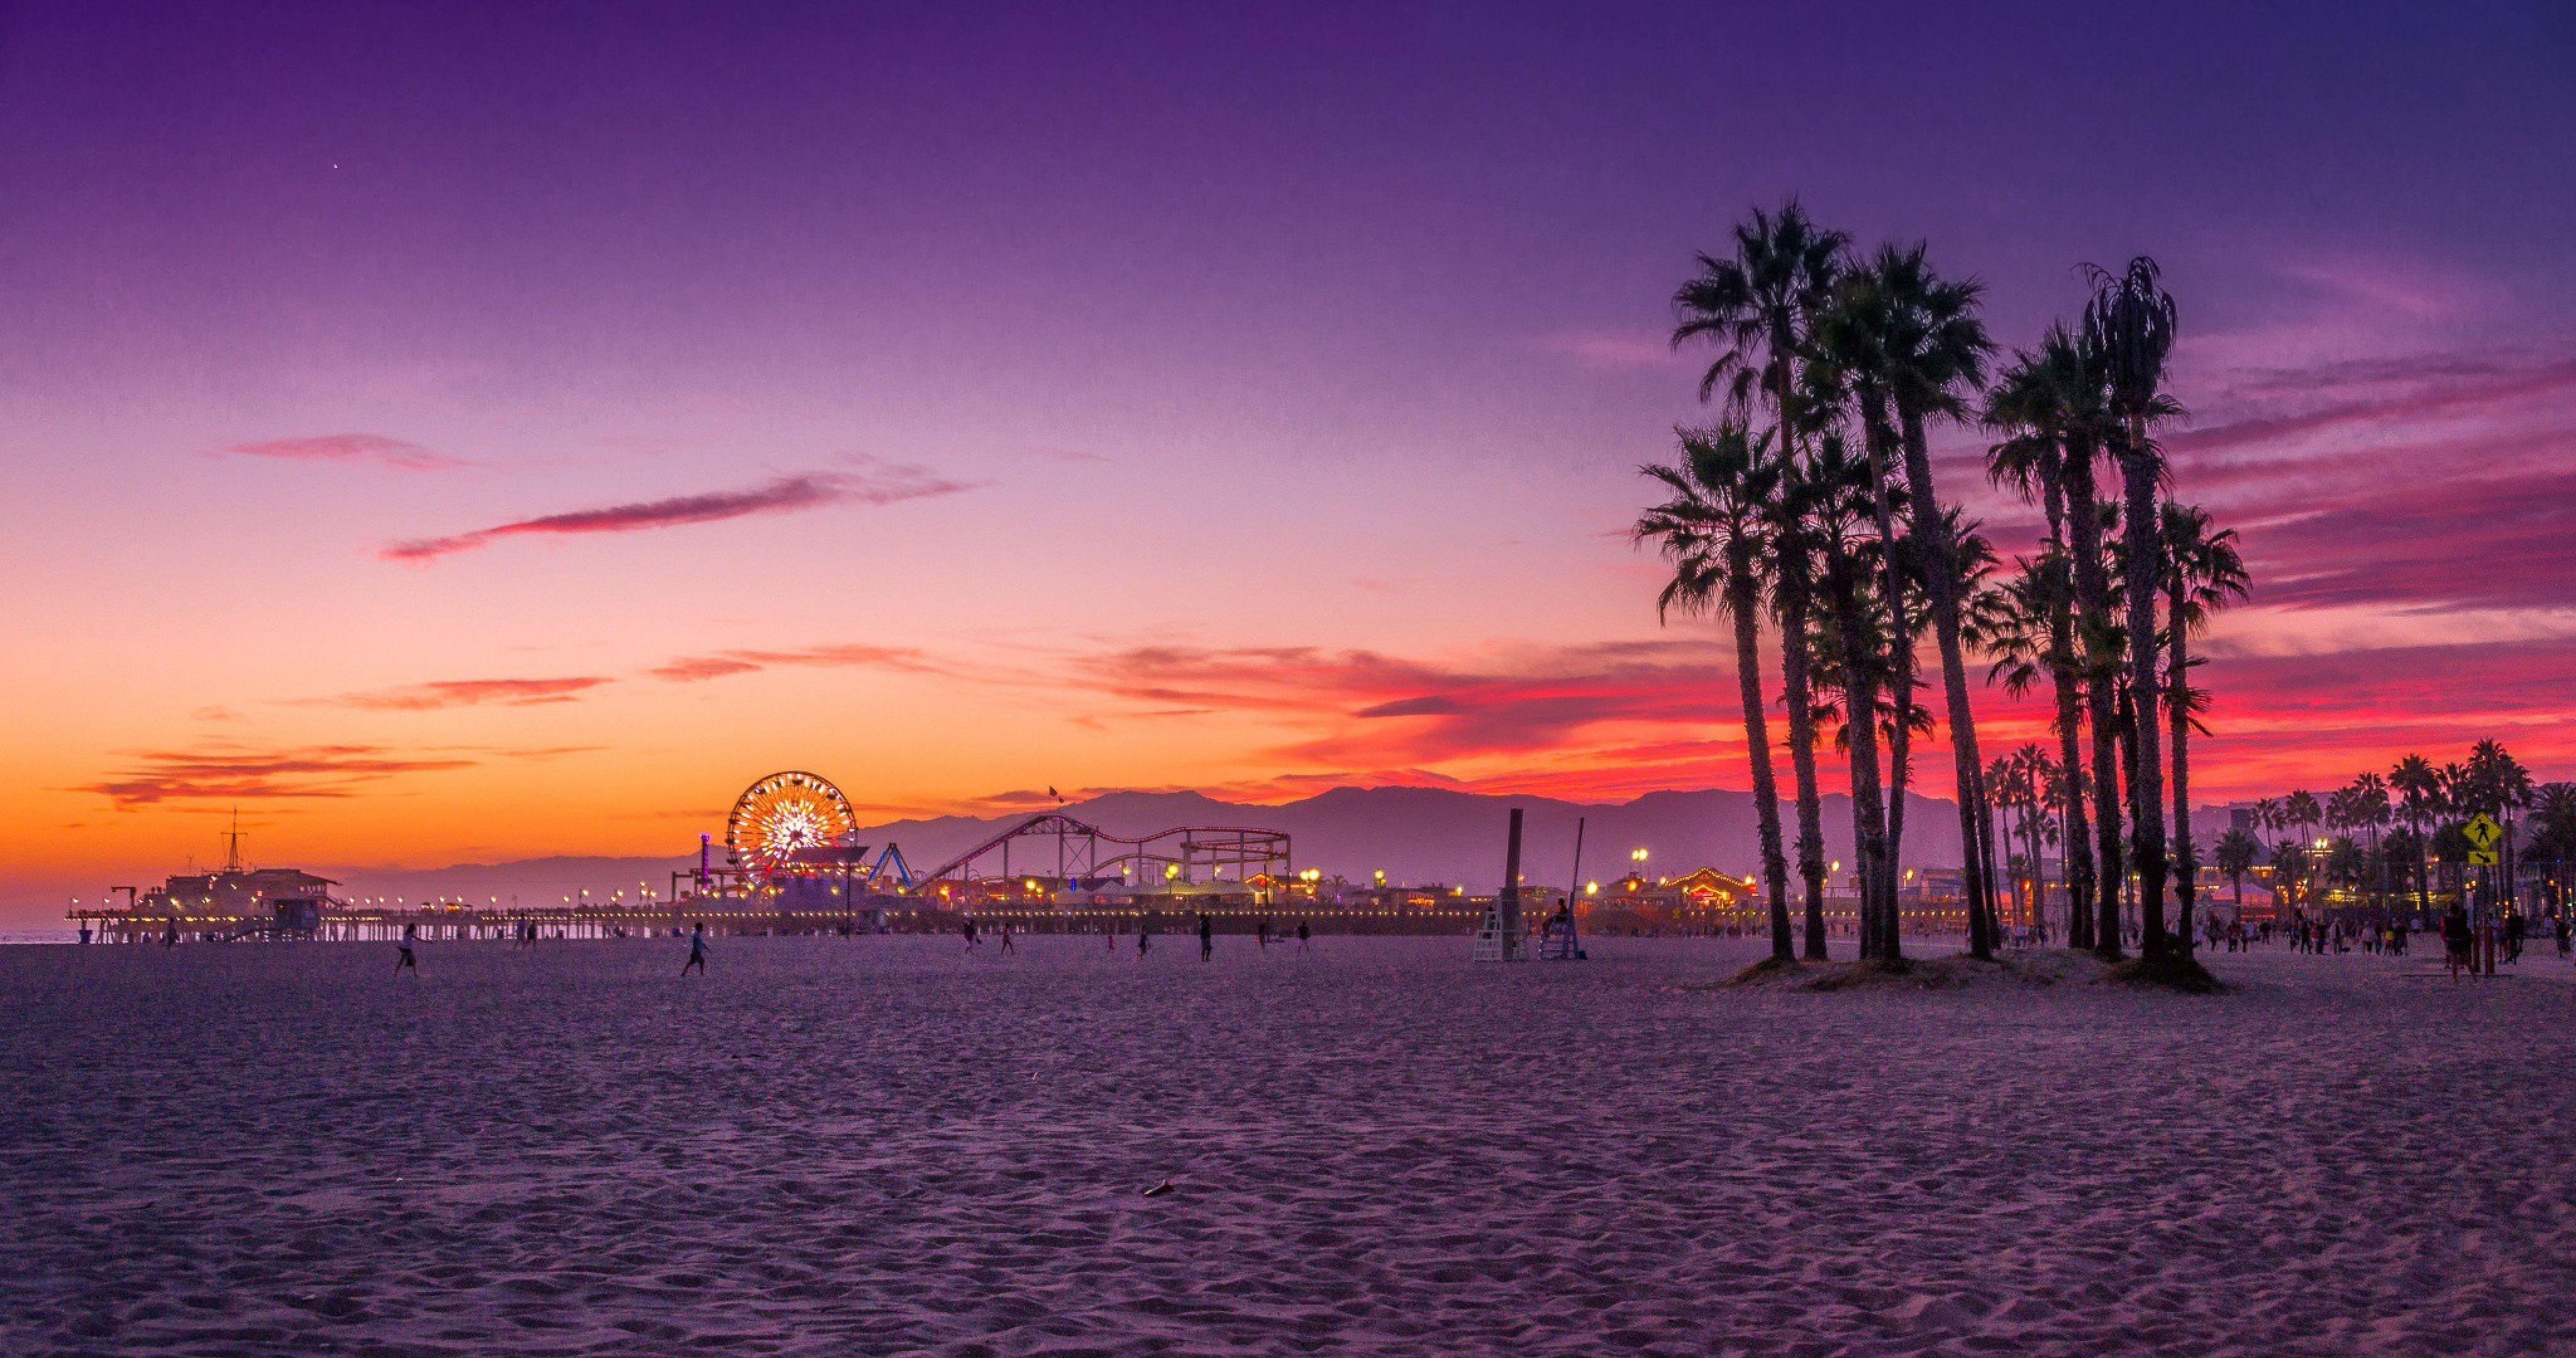 Los Angeles Santa Monica Beach California Wallpaper Los Angeles Wallpaper Los Angeles Beaches